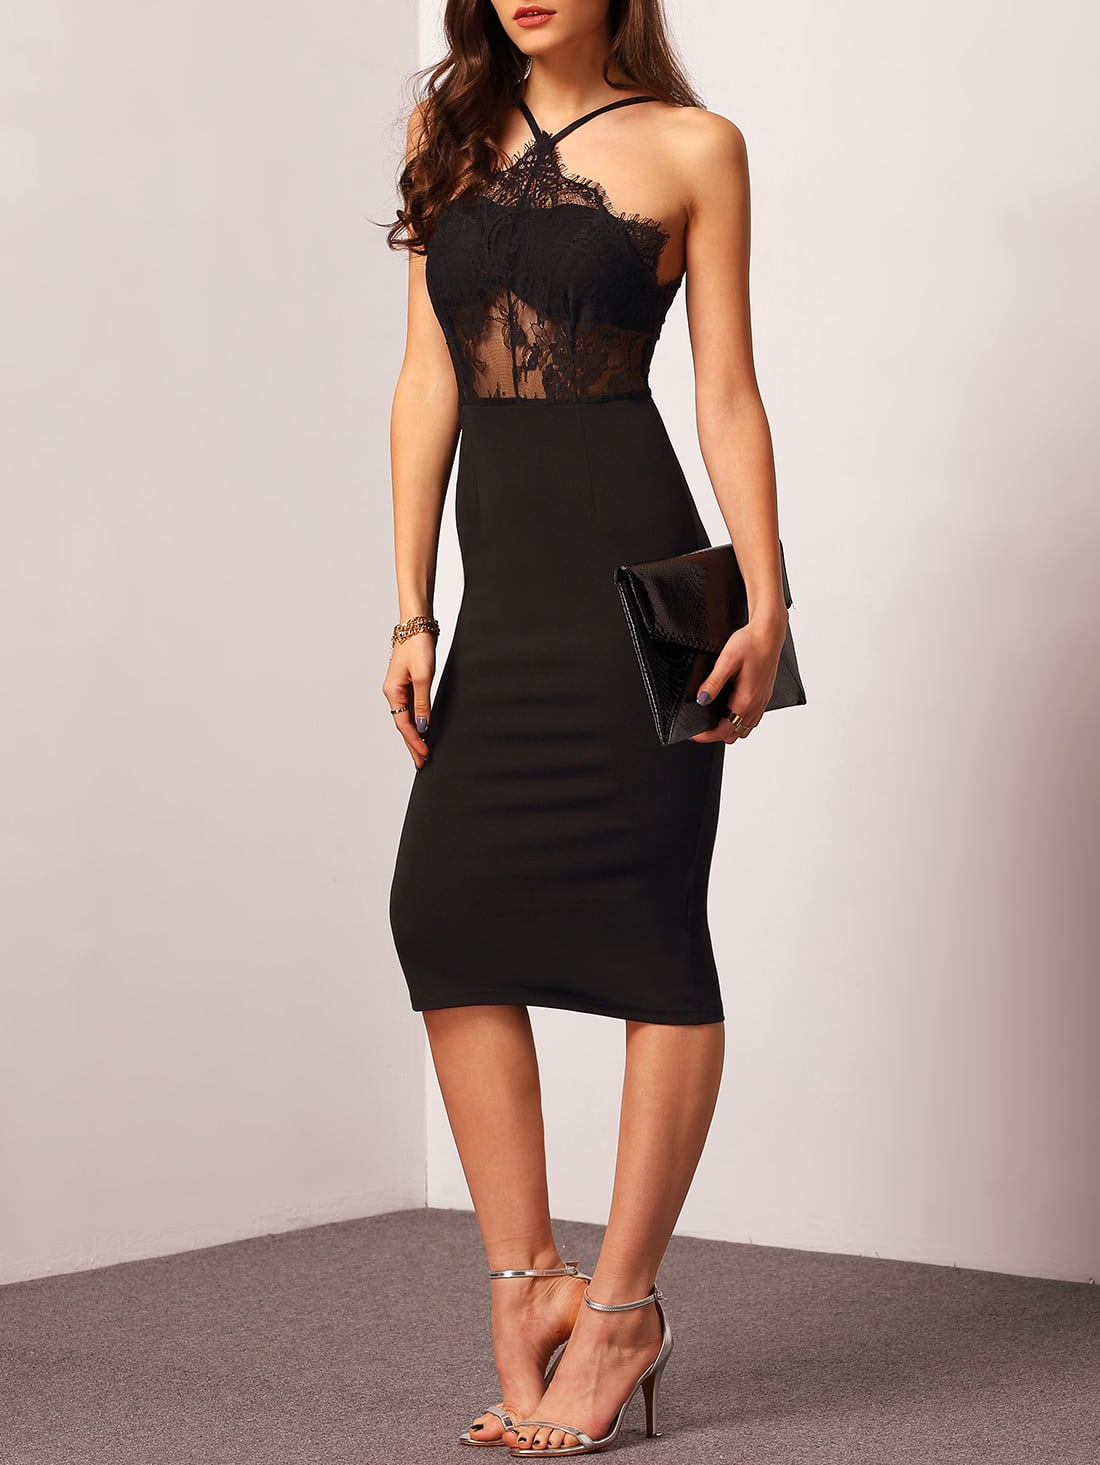 Halter Contrast Lace Sheath Dress sheath lace pencil dress